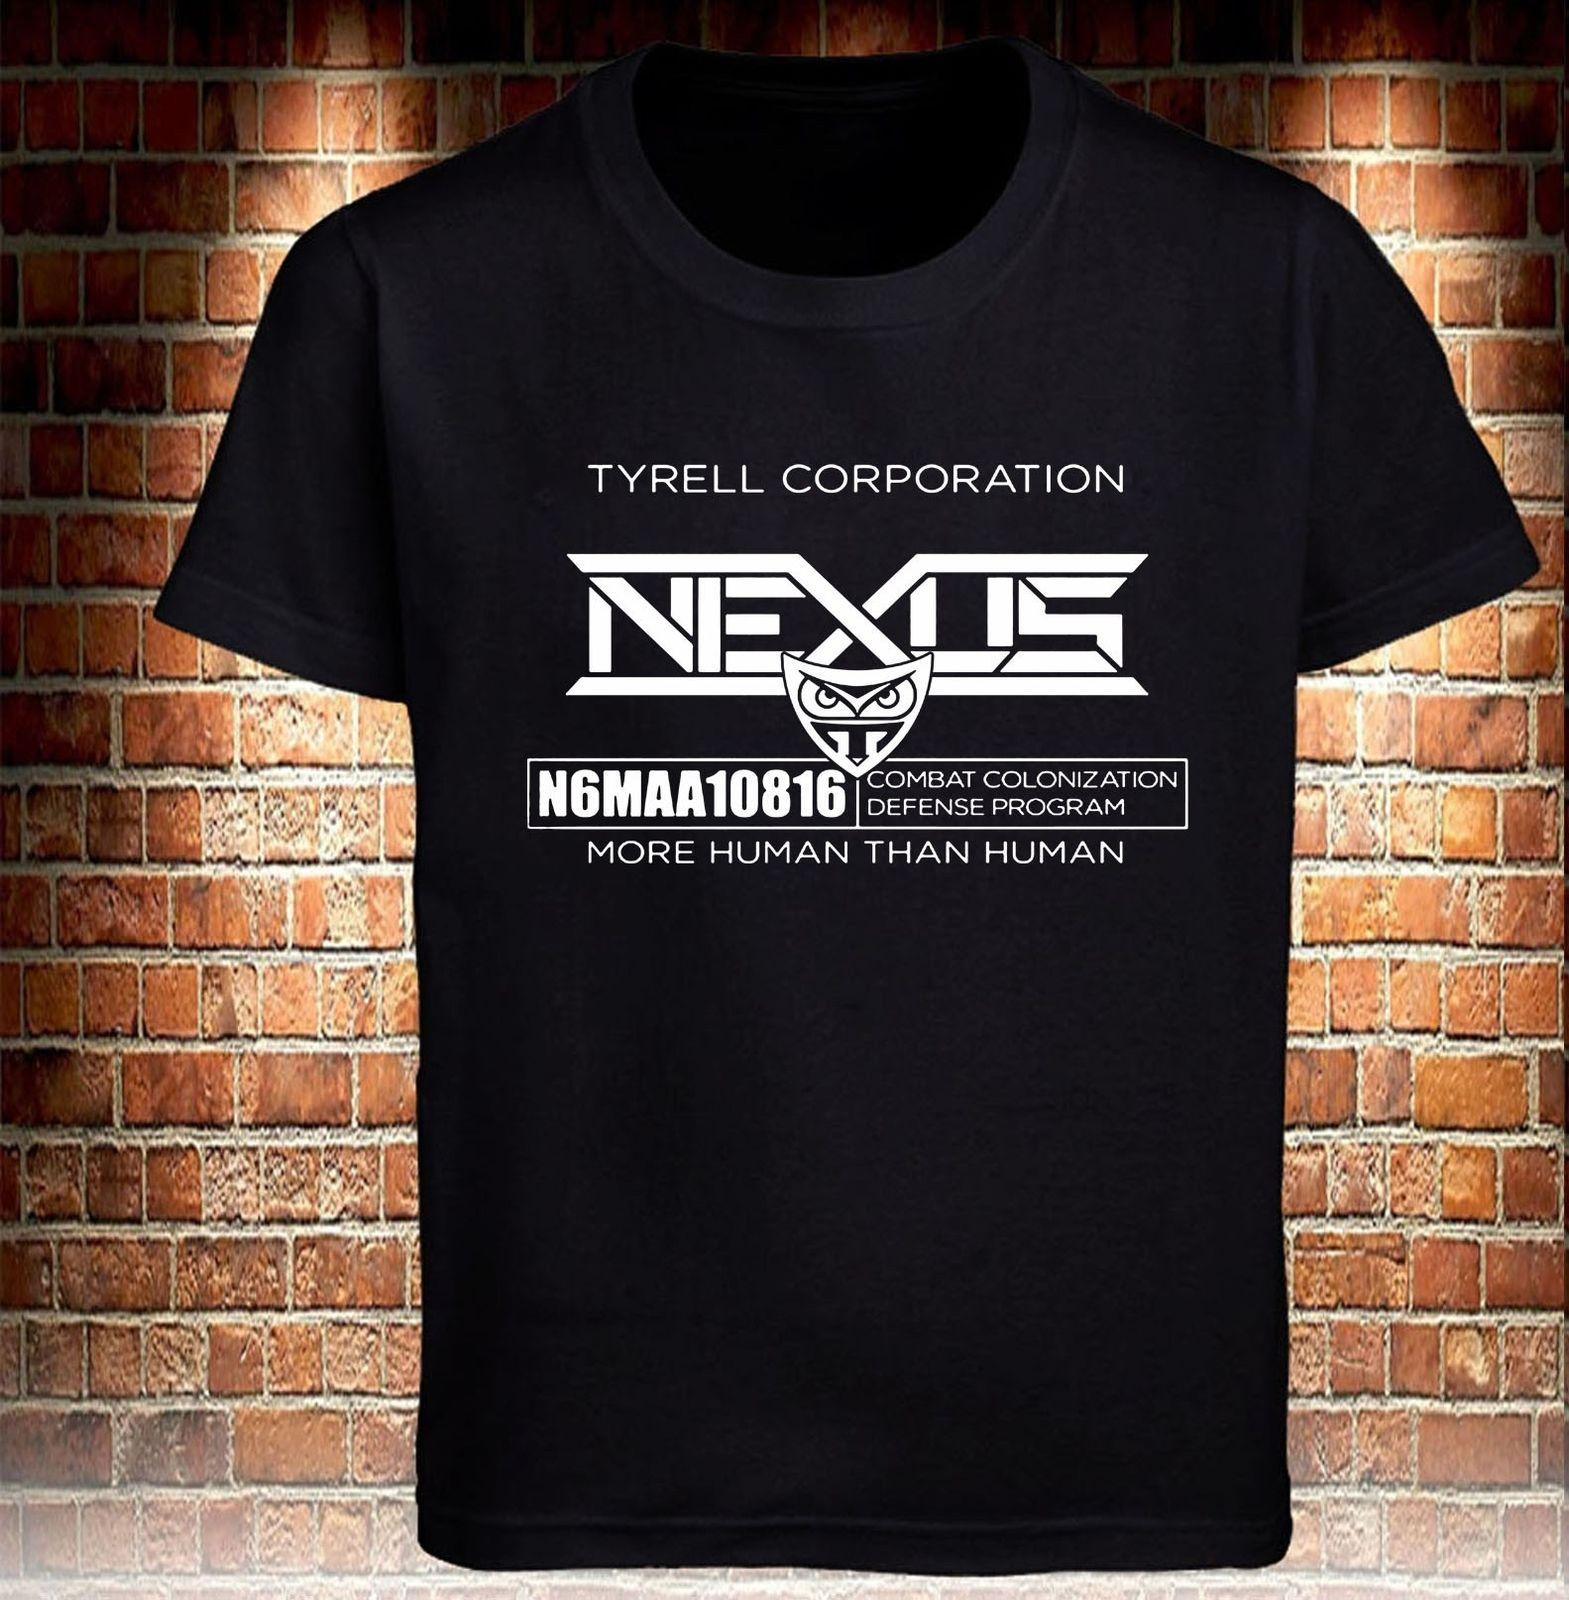 d6cb8537d7 Black T-shirt Blade Runner Nexus Tyrell Corp Men s Grey Tee Size S To 3xl  Cool Casual Pride T Shirt Men Unisex Fashion Tshirt